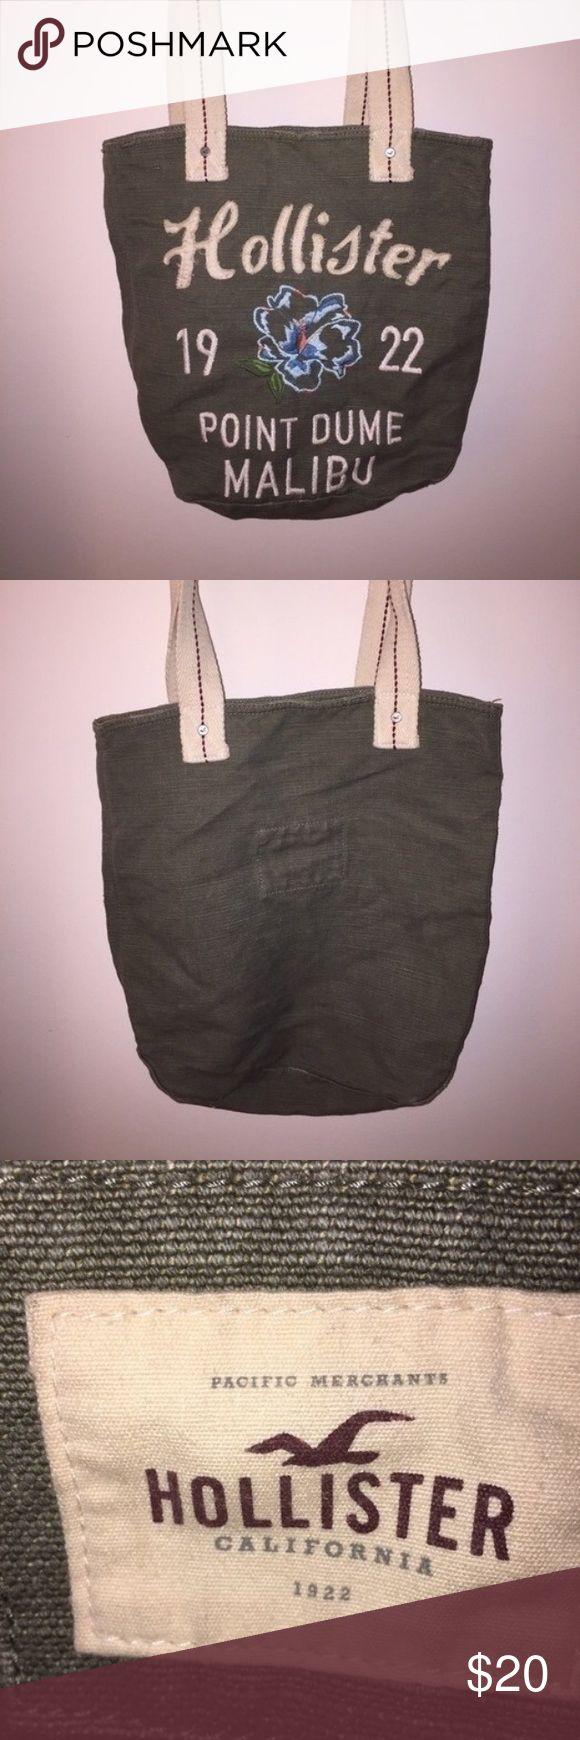 Hollister Bag Hollister Bag Hollister Bags Totes